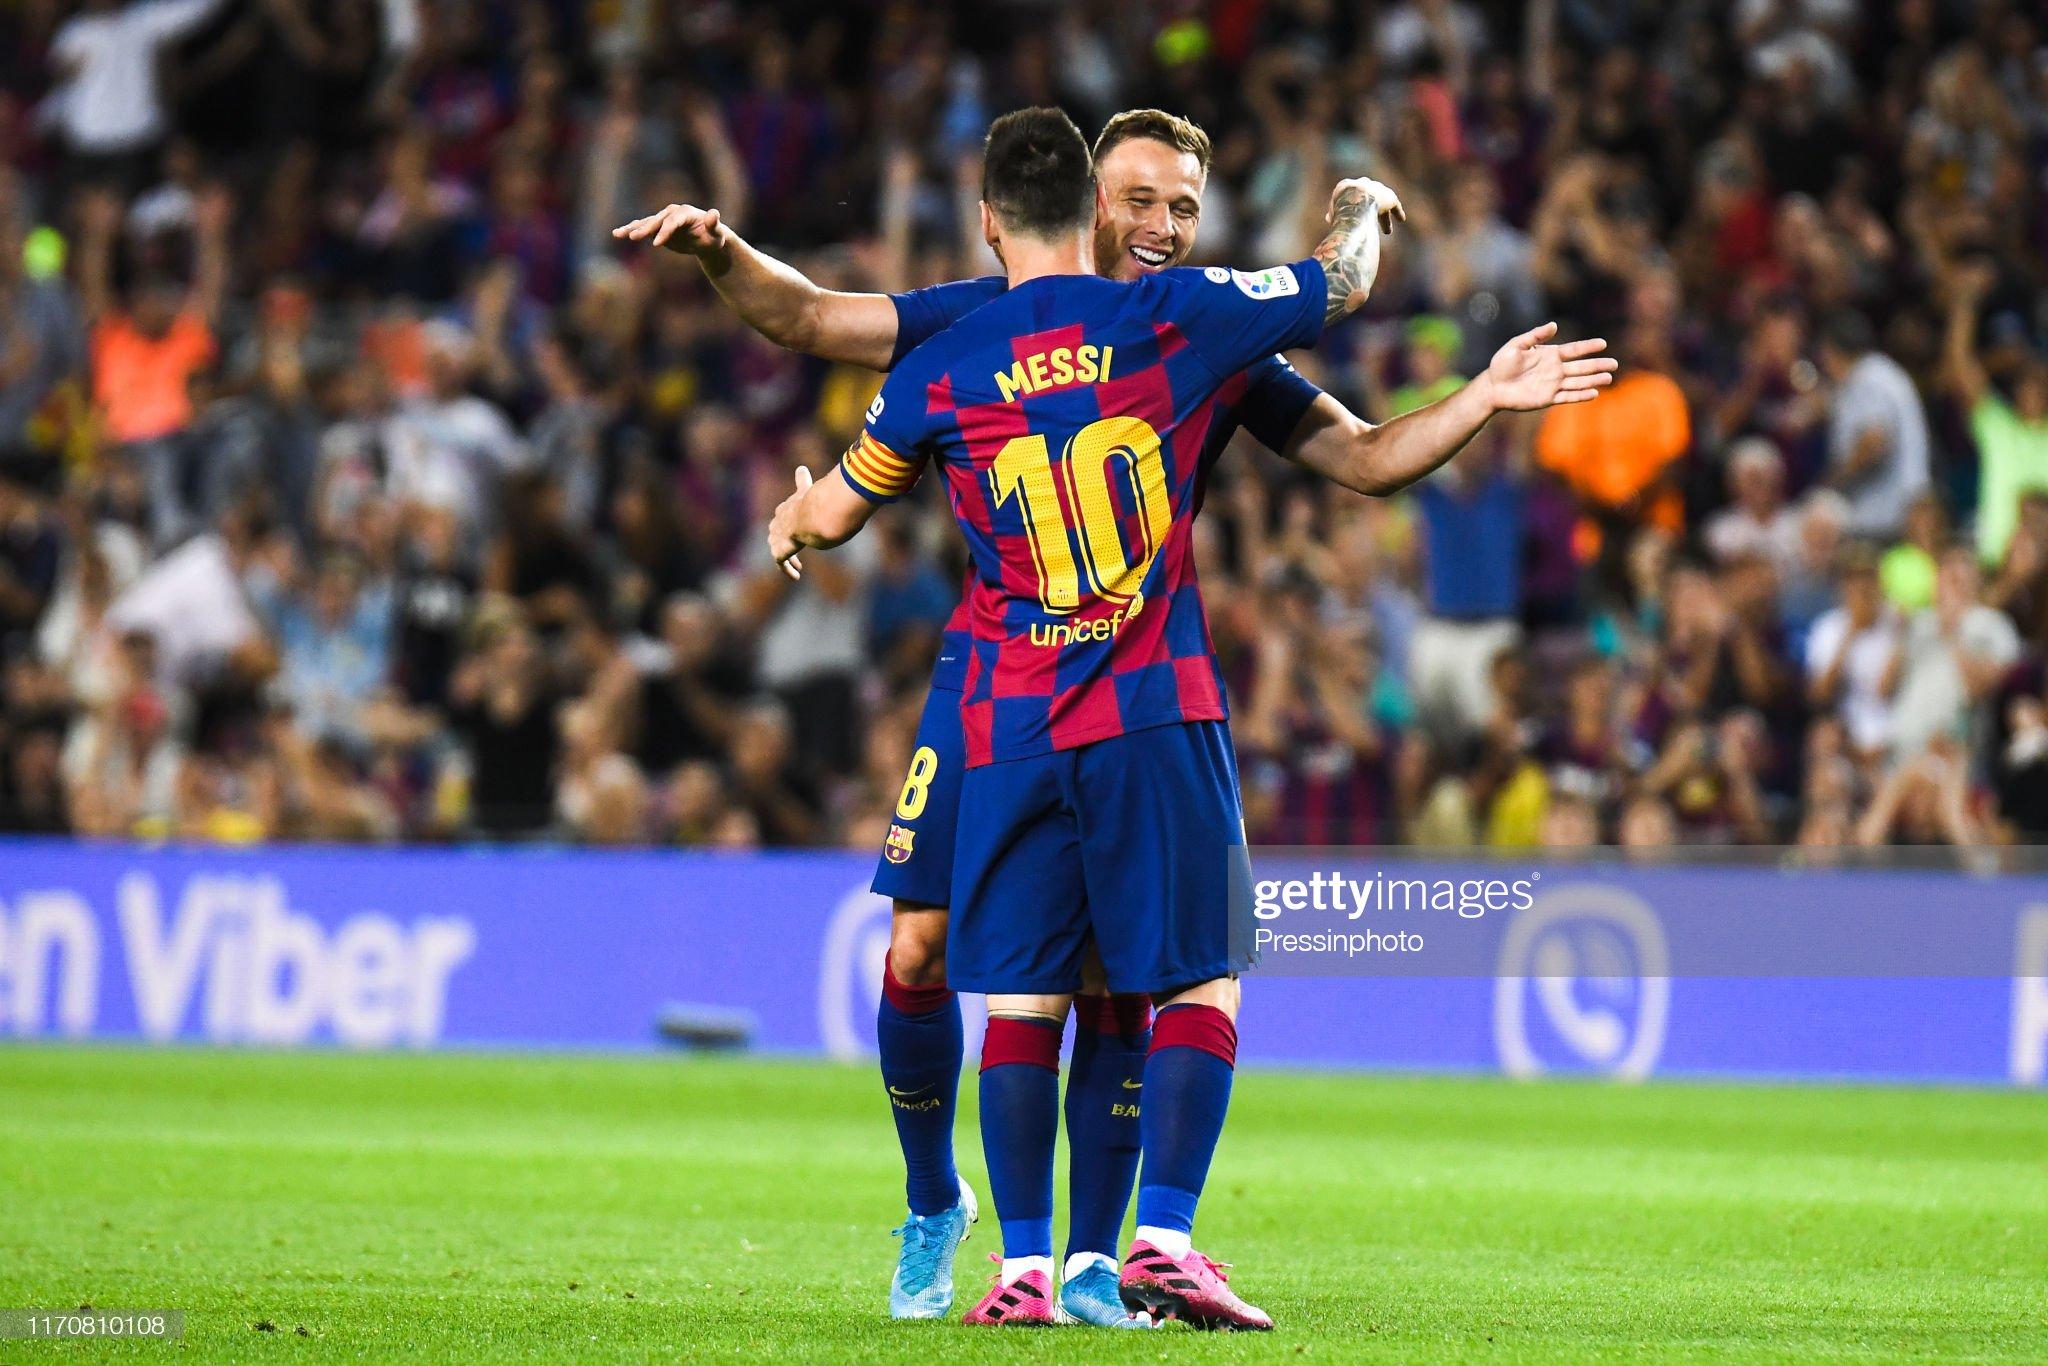 صور مباراة : برشلونة - فياريال 2-1 ( 24-09-2019 )  Arthur-melo-of-fc-barcelona-celebrates-his-goal-with-his-teammates-picture-id1170810108?s=2048x2048